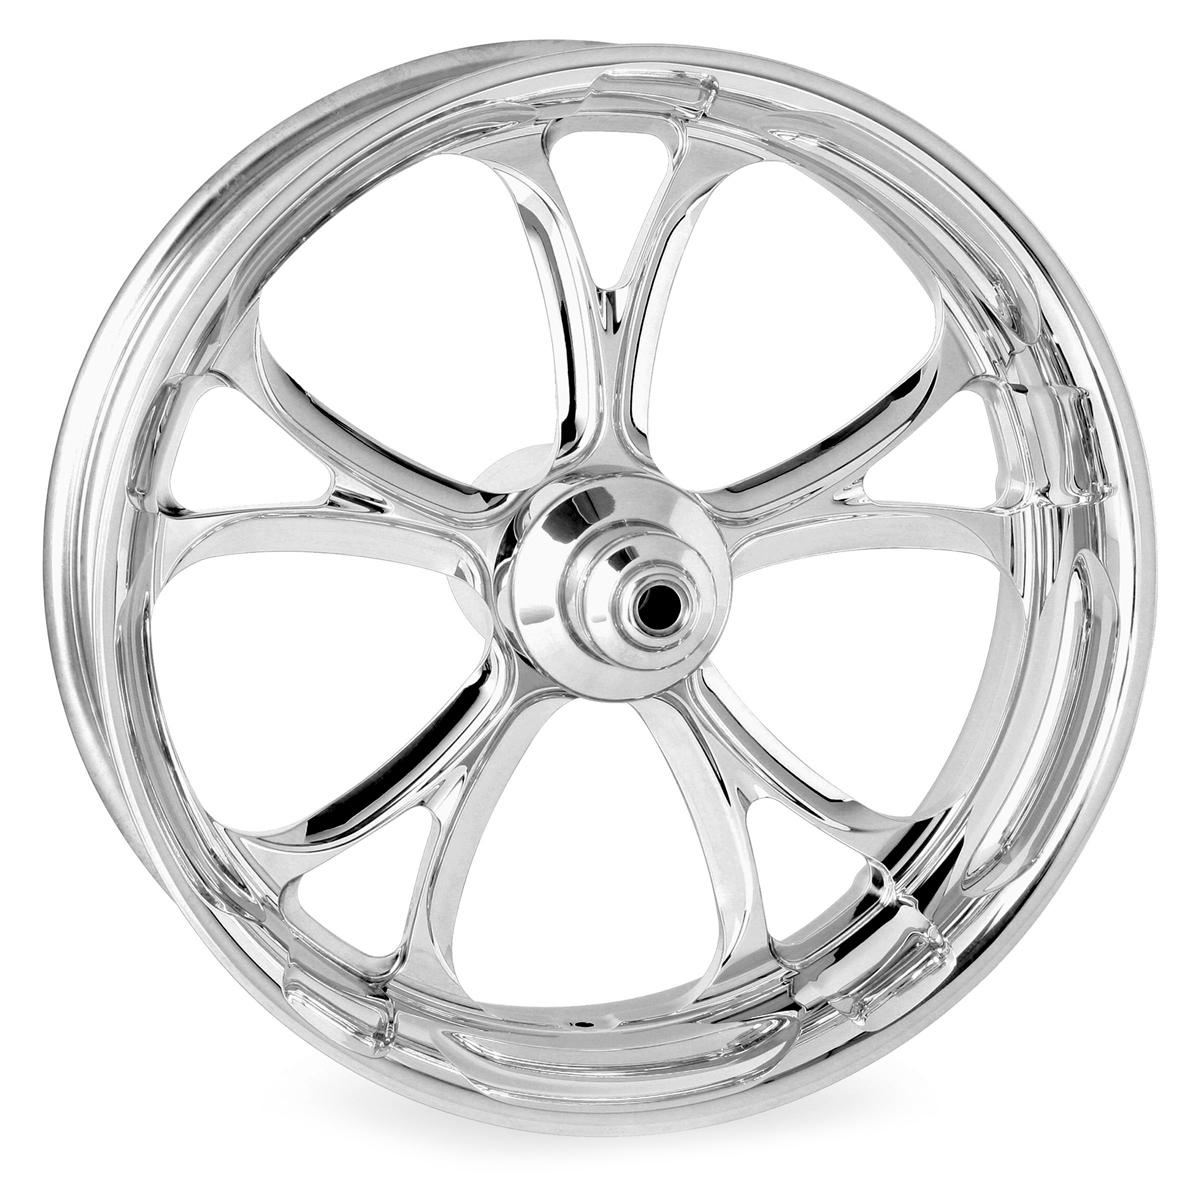 Performance Machine Luxe Chrome Rear Wheel 15x5.5